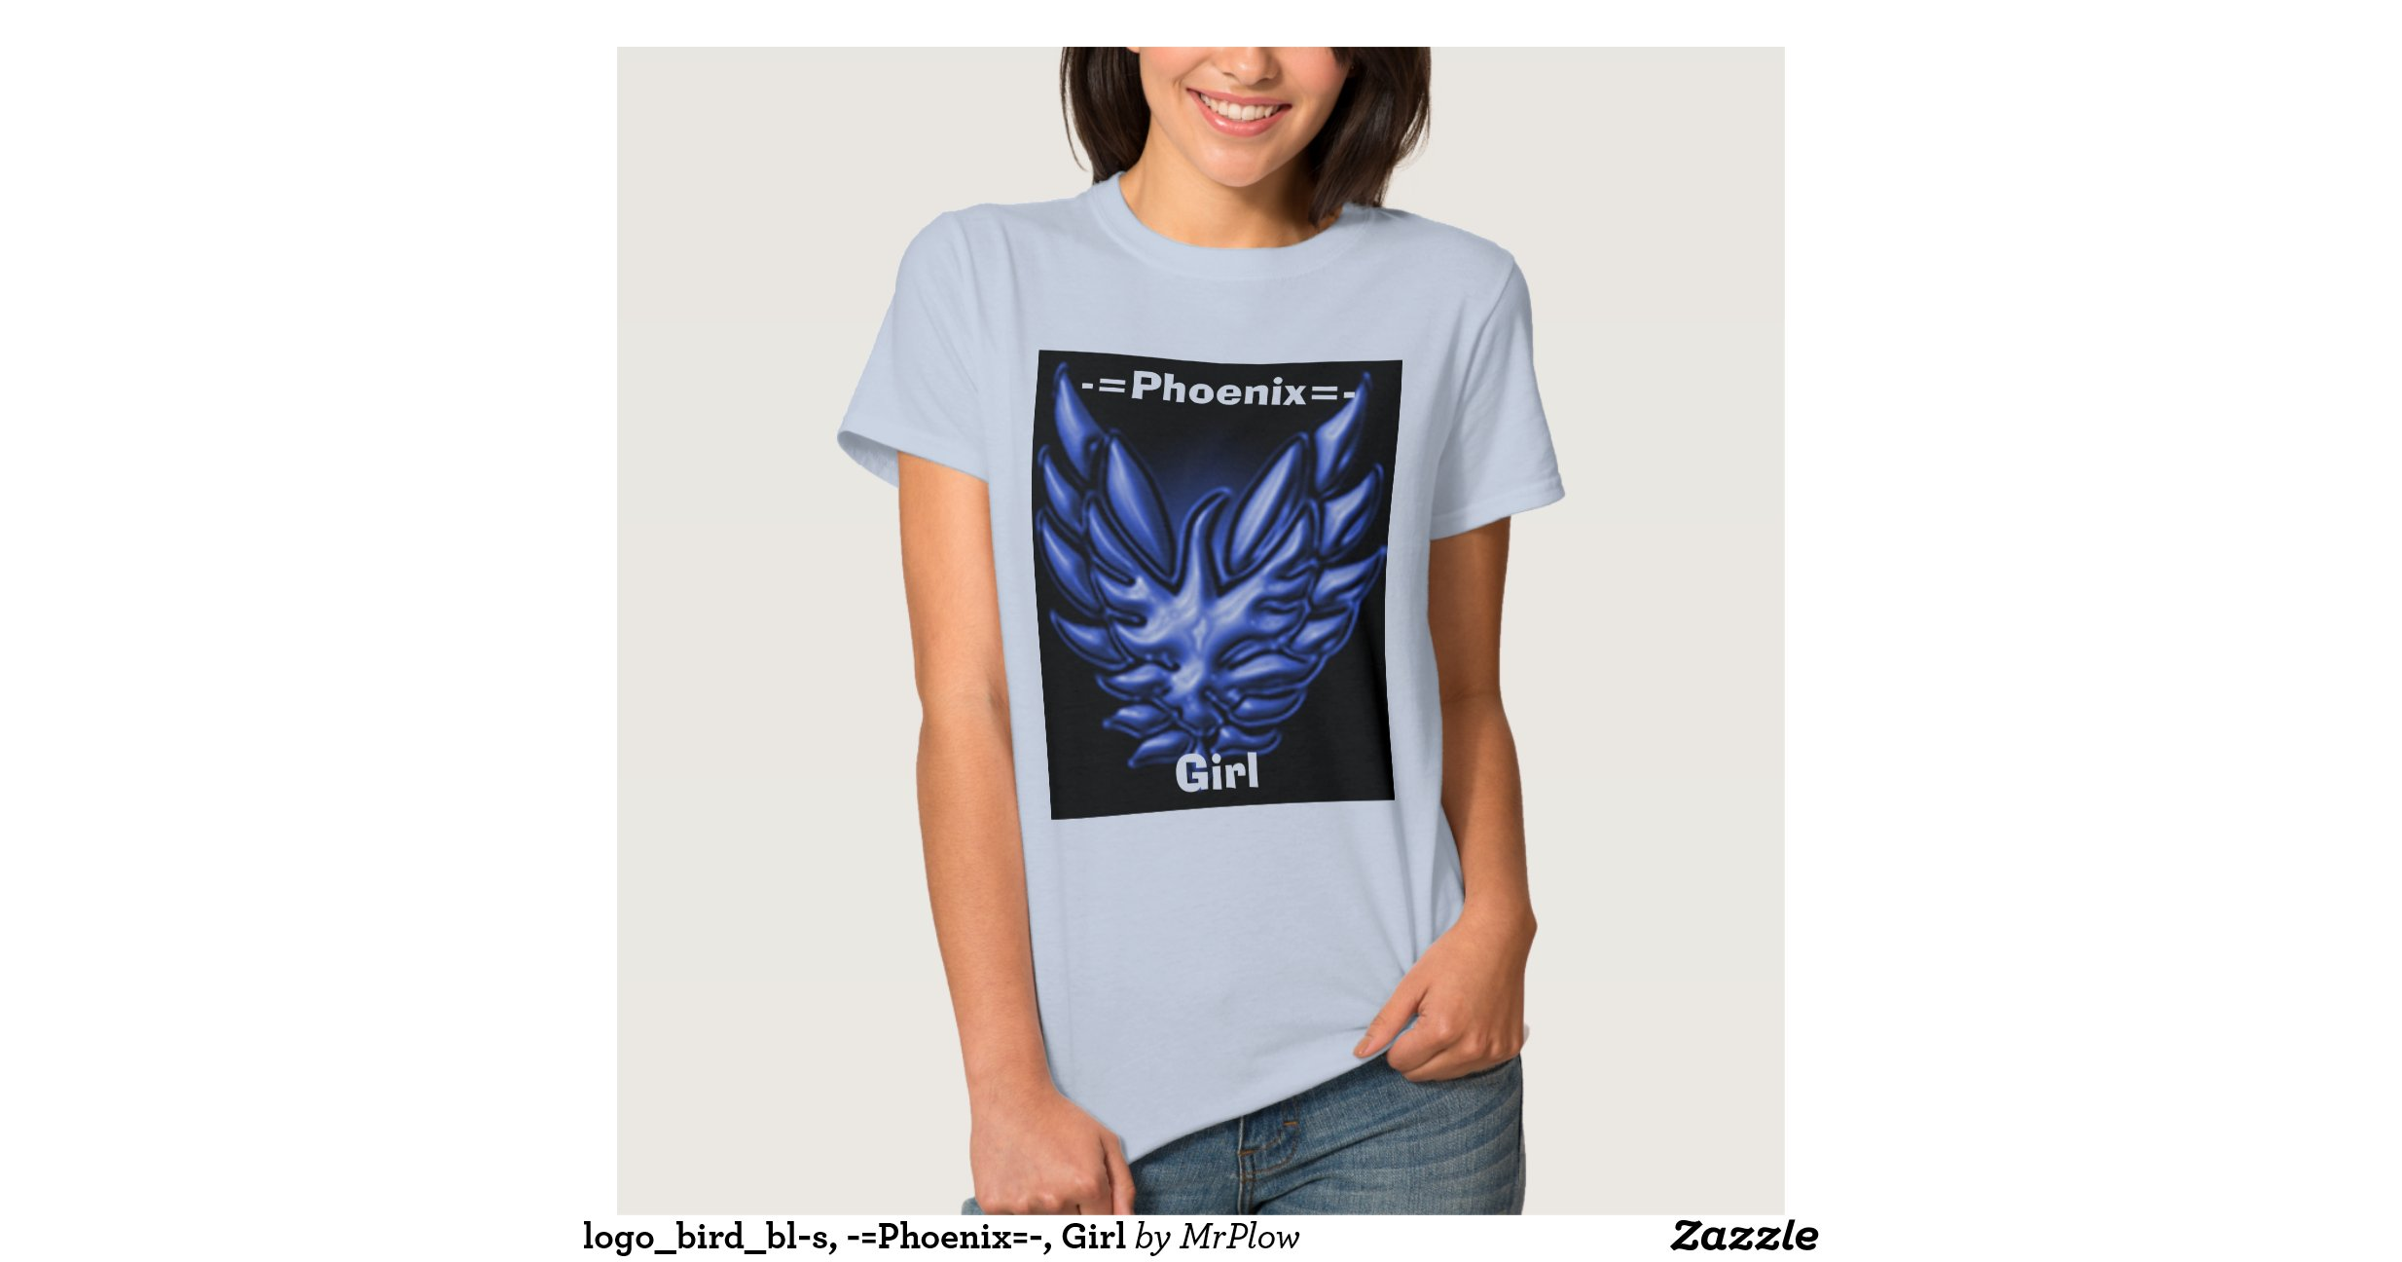 Logo bird bl s phoenix girl tshirt zazzle for Phoenix t shirt printing